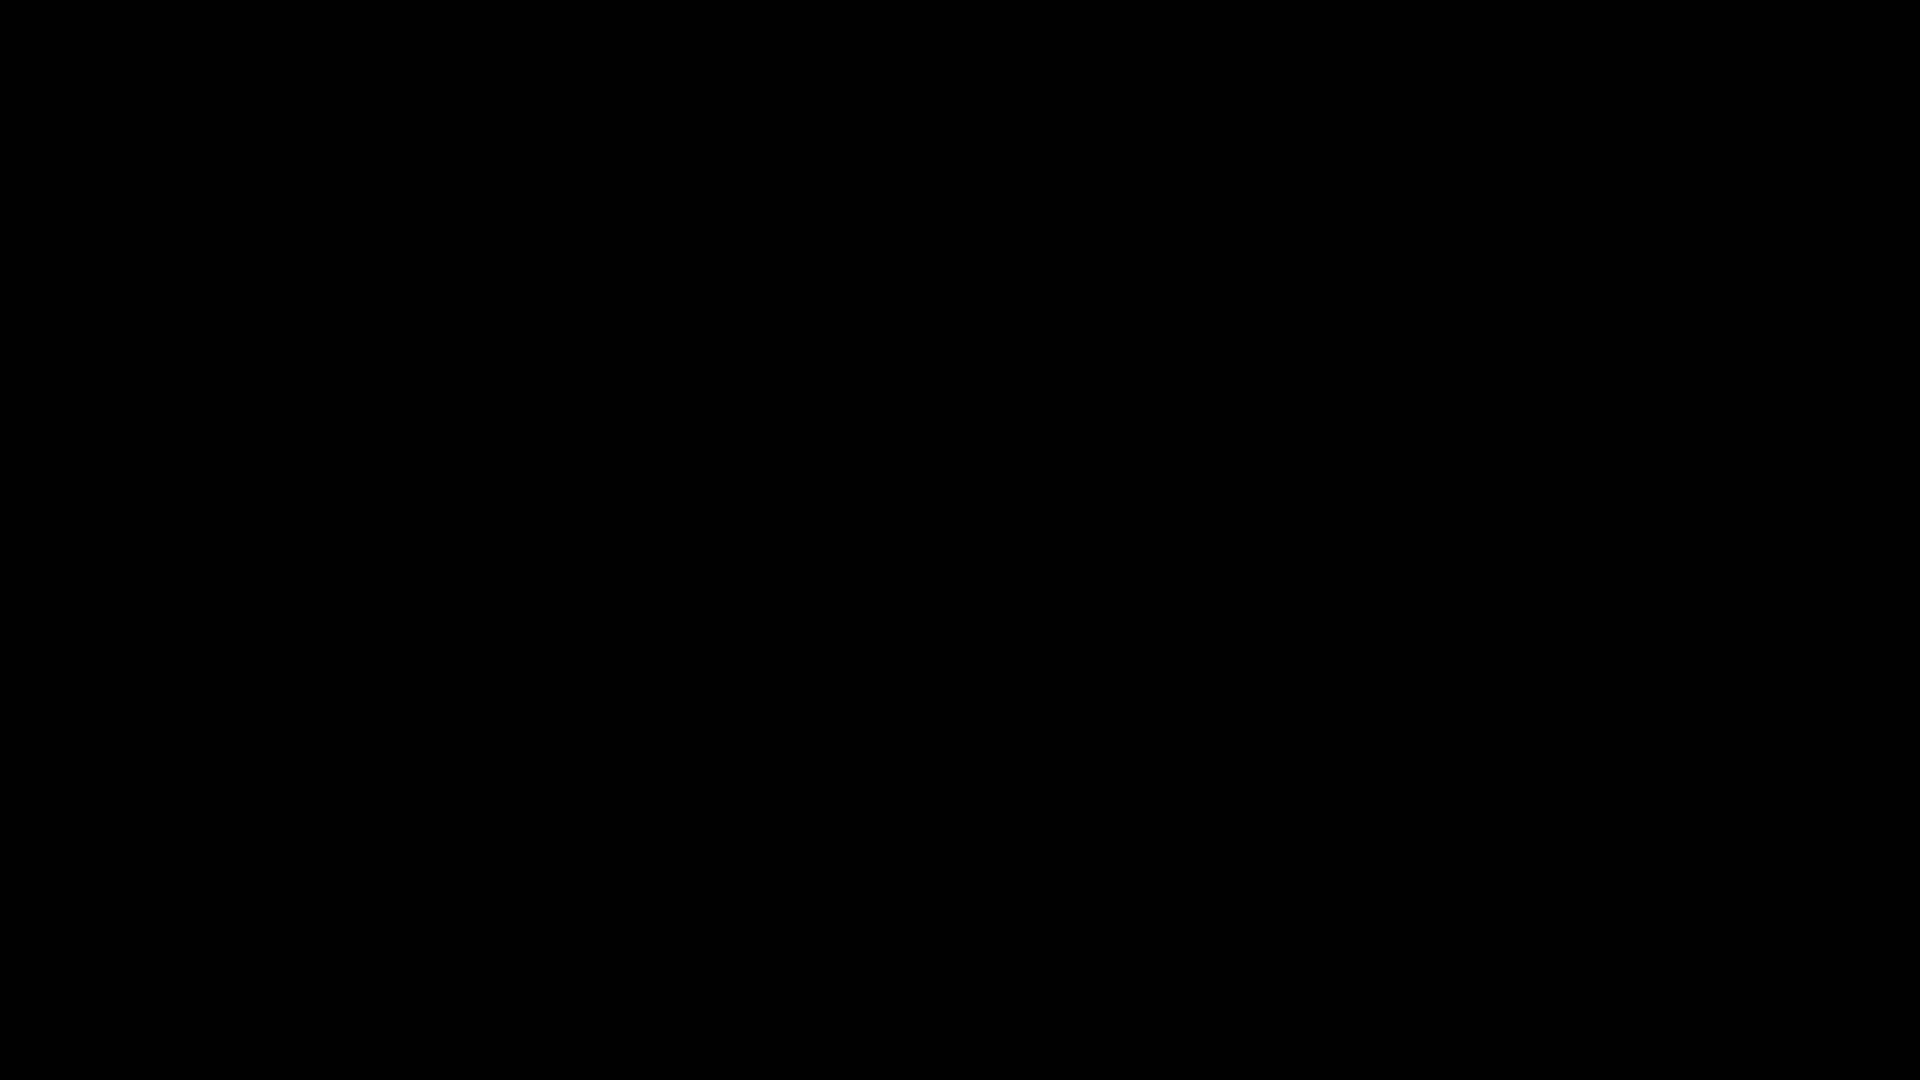 Animals in the snow, Arctic, Arctic Foxes in the snow, Foxes in the snow, Nature, Snowing, Stefano Ianiro, Wildlife, Wildlife Photography snow, arctic fox, arctic foxes, environment, filming foxes, fox photography, foxes, mammals, nature photography, north america, wildlife biologist, wildlife photography, ARCTIC FOXES in the Snow GIFs